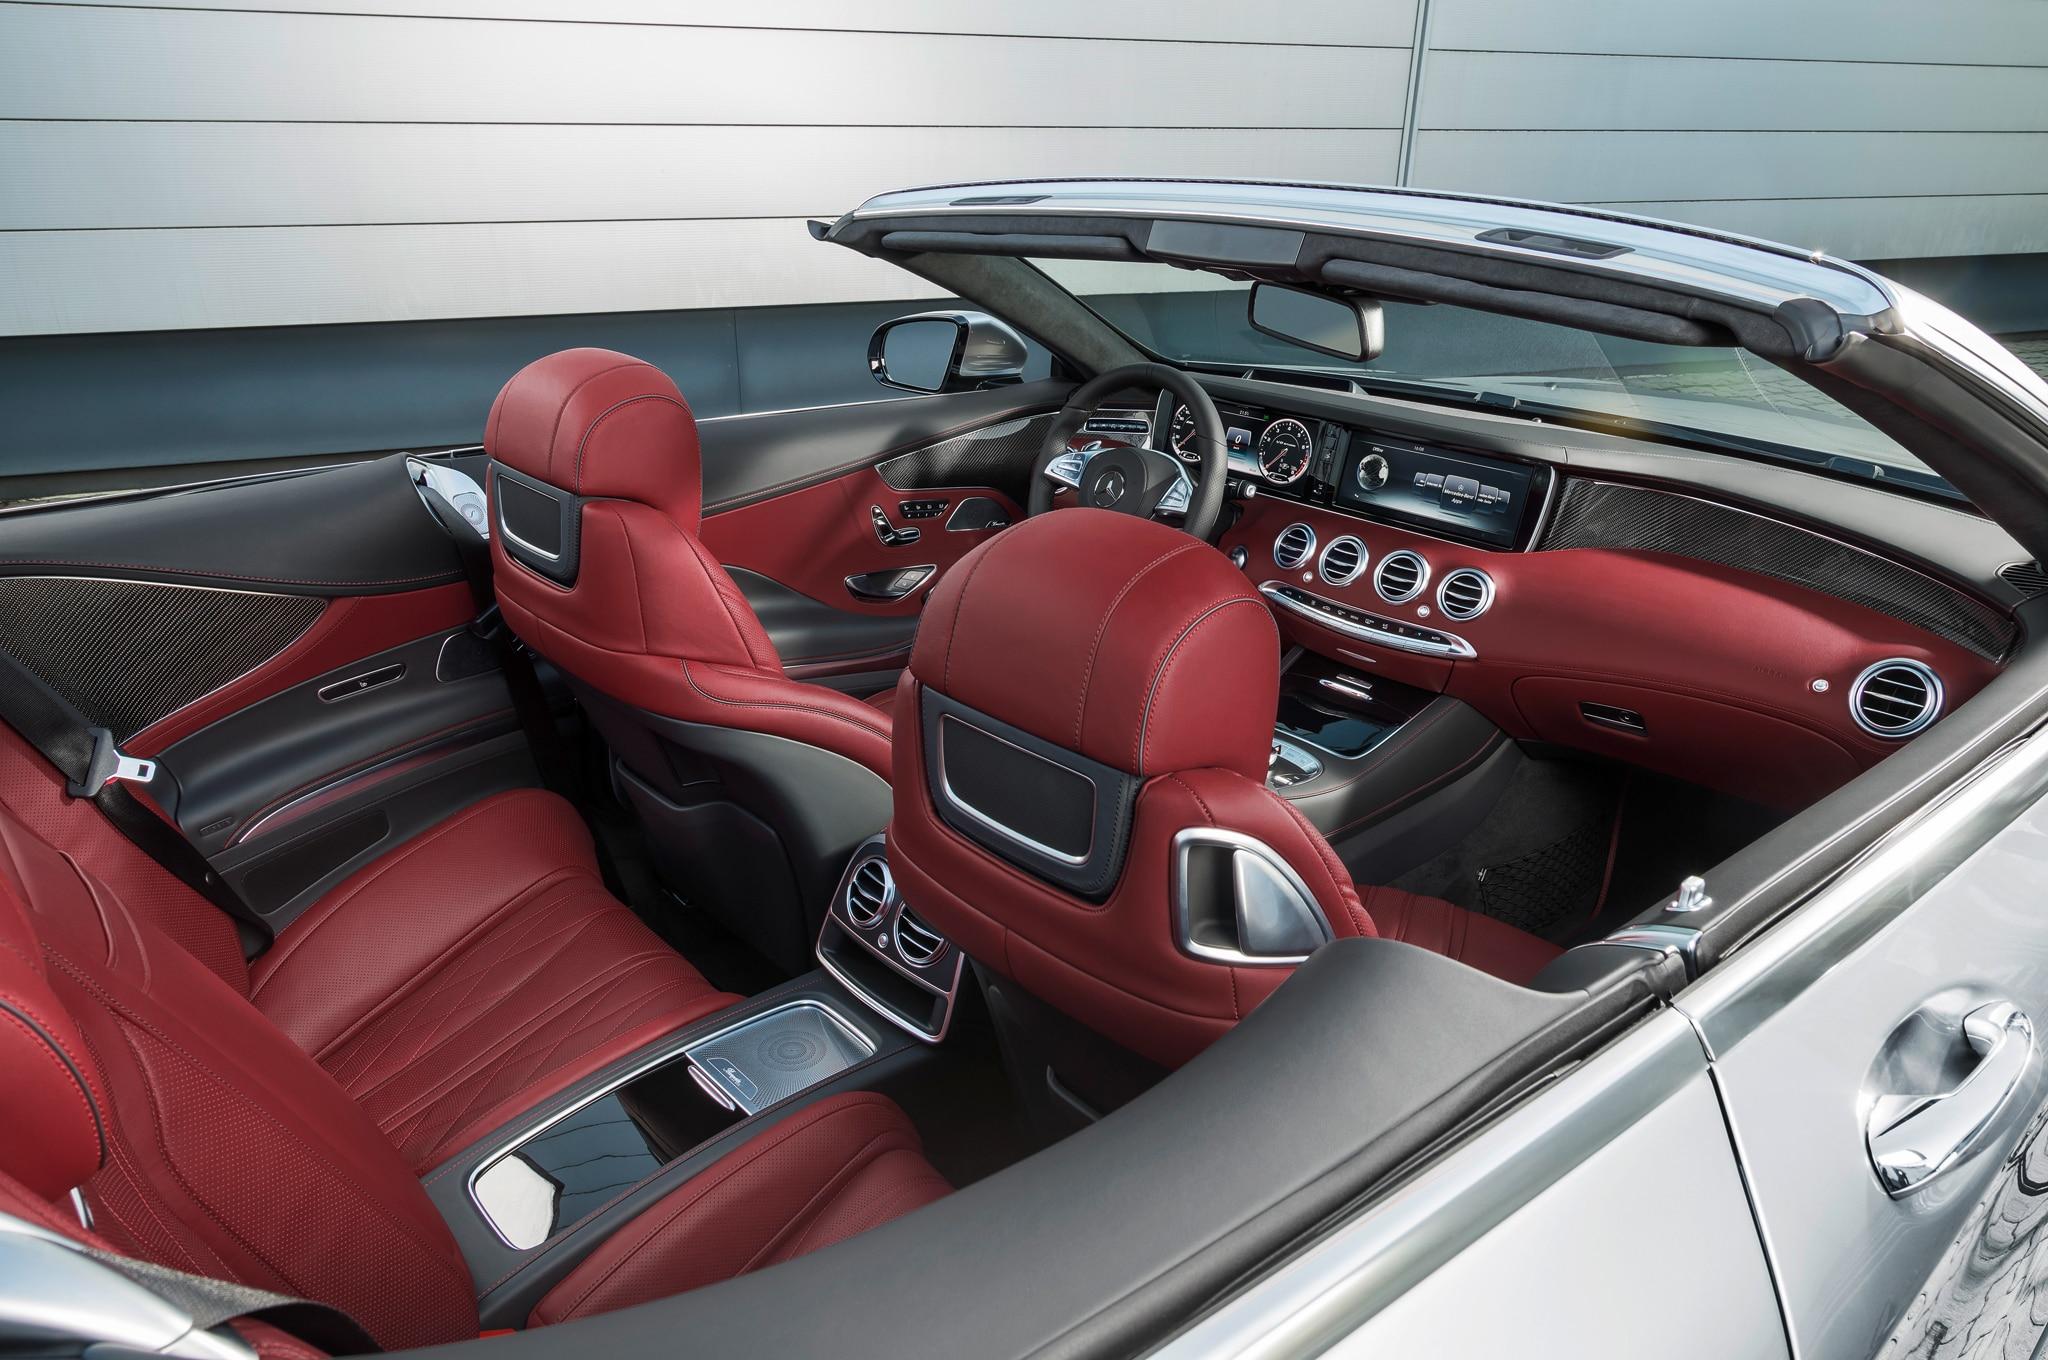 2017 Mercedes Amg S63 Cabriolet Quot Edition 130 Quot Bows In Detroit